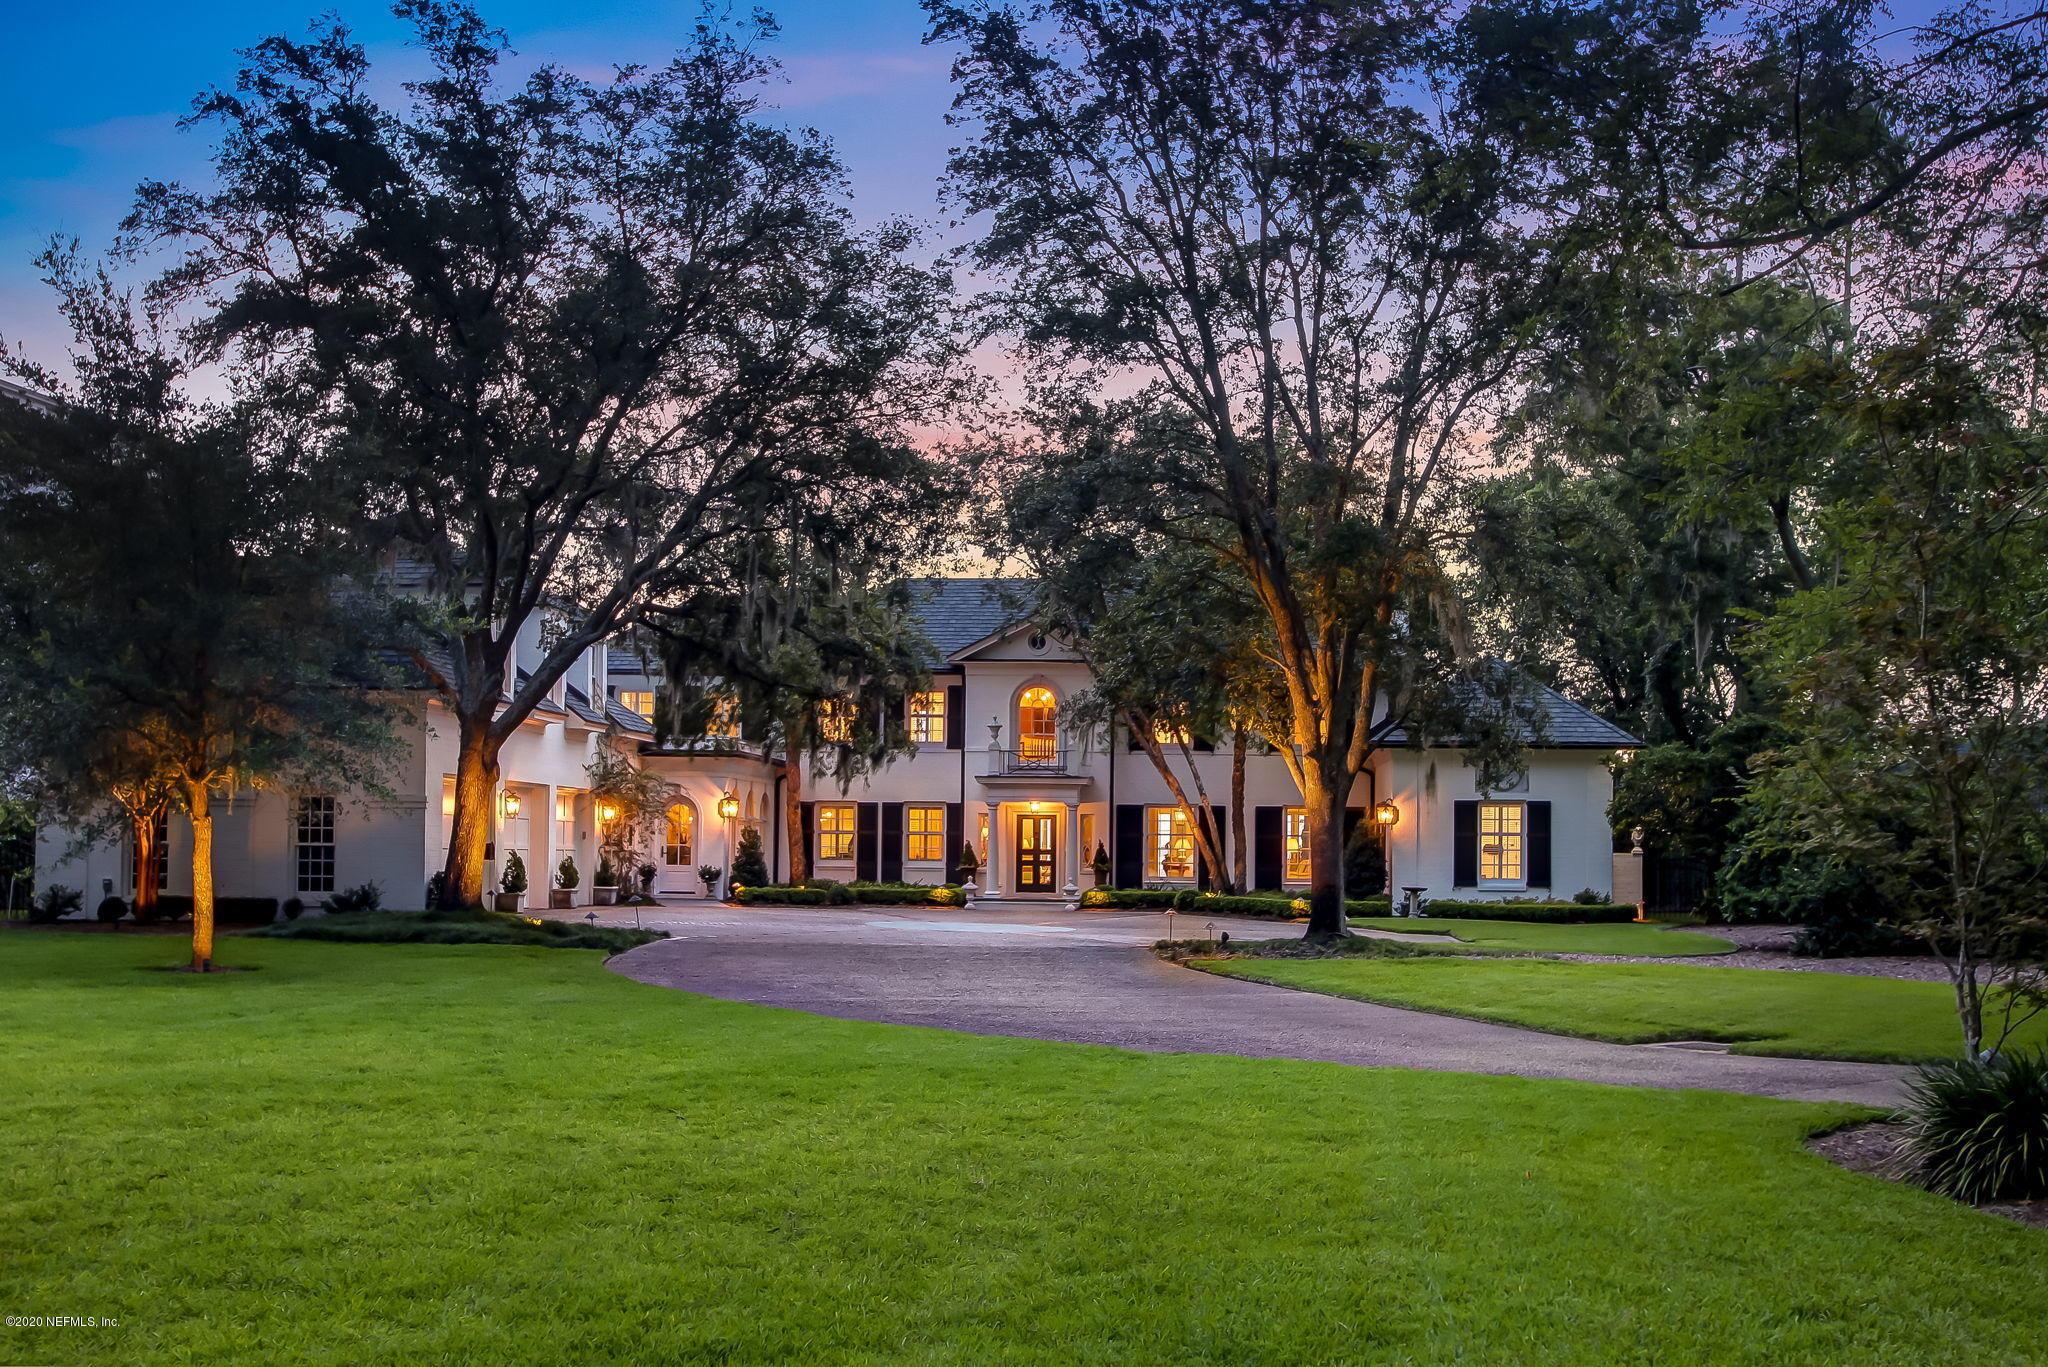 4997 MORVEN, JACKSONVILLE, FLORIDA 32210, 4 Bedrooms Bedrooms, ,5 BathroomsBathrooms,Residential,For sale,MORVEN,1079462